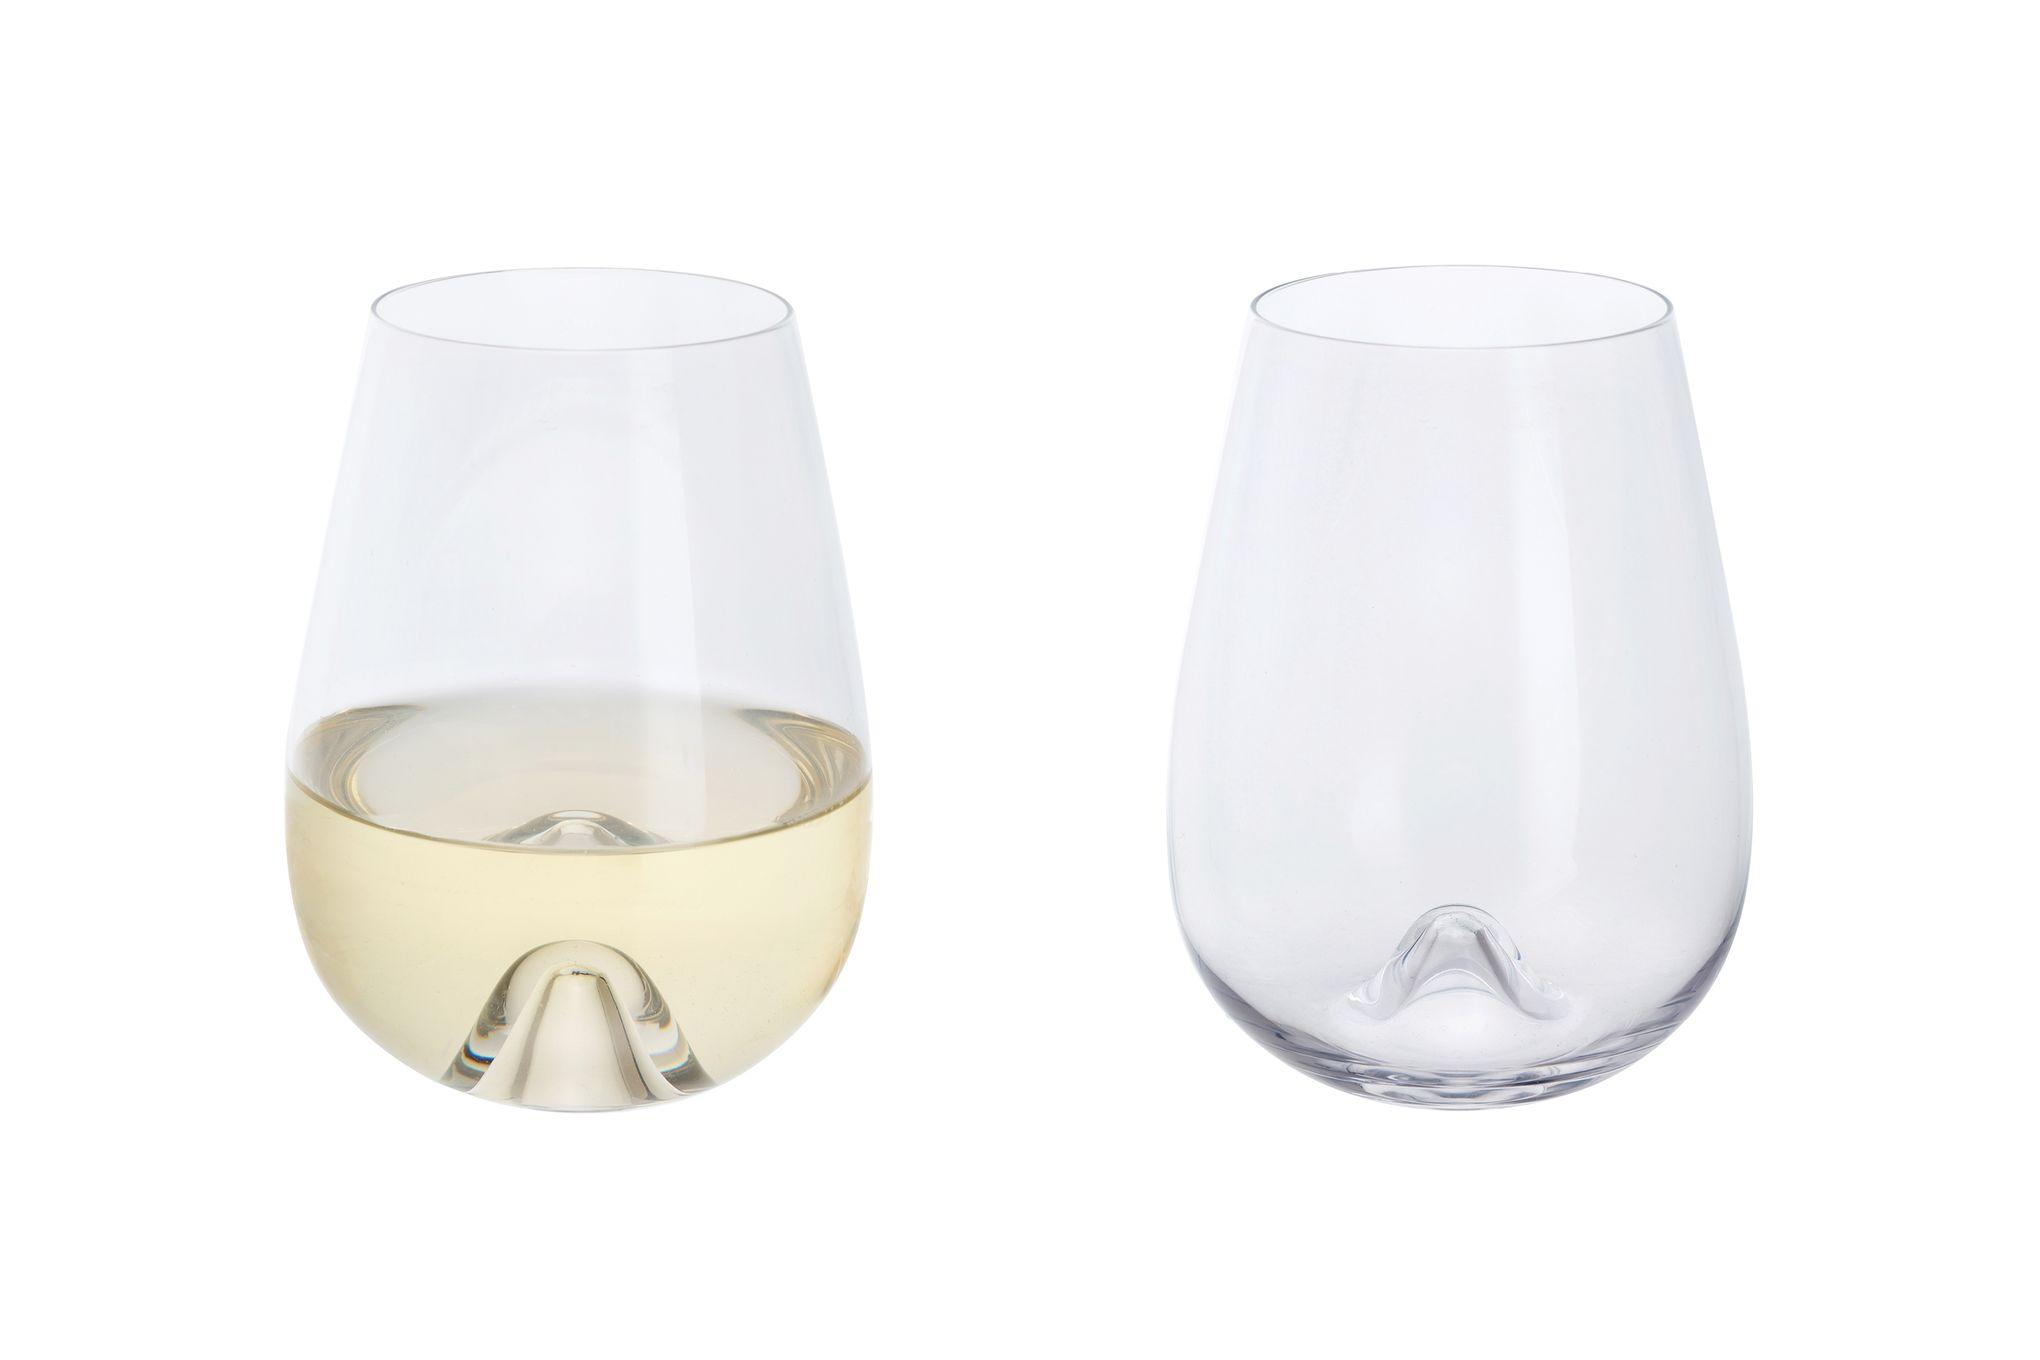 Dartington Crystal Wine & Bar Pair of White Wine Glasses Stemless 475ml thumb 1